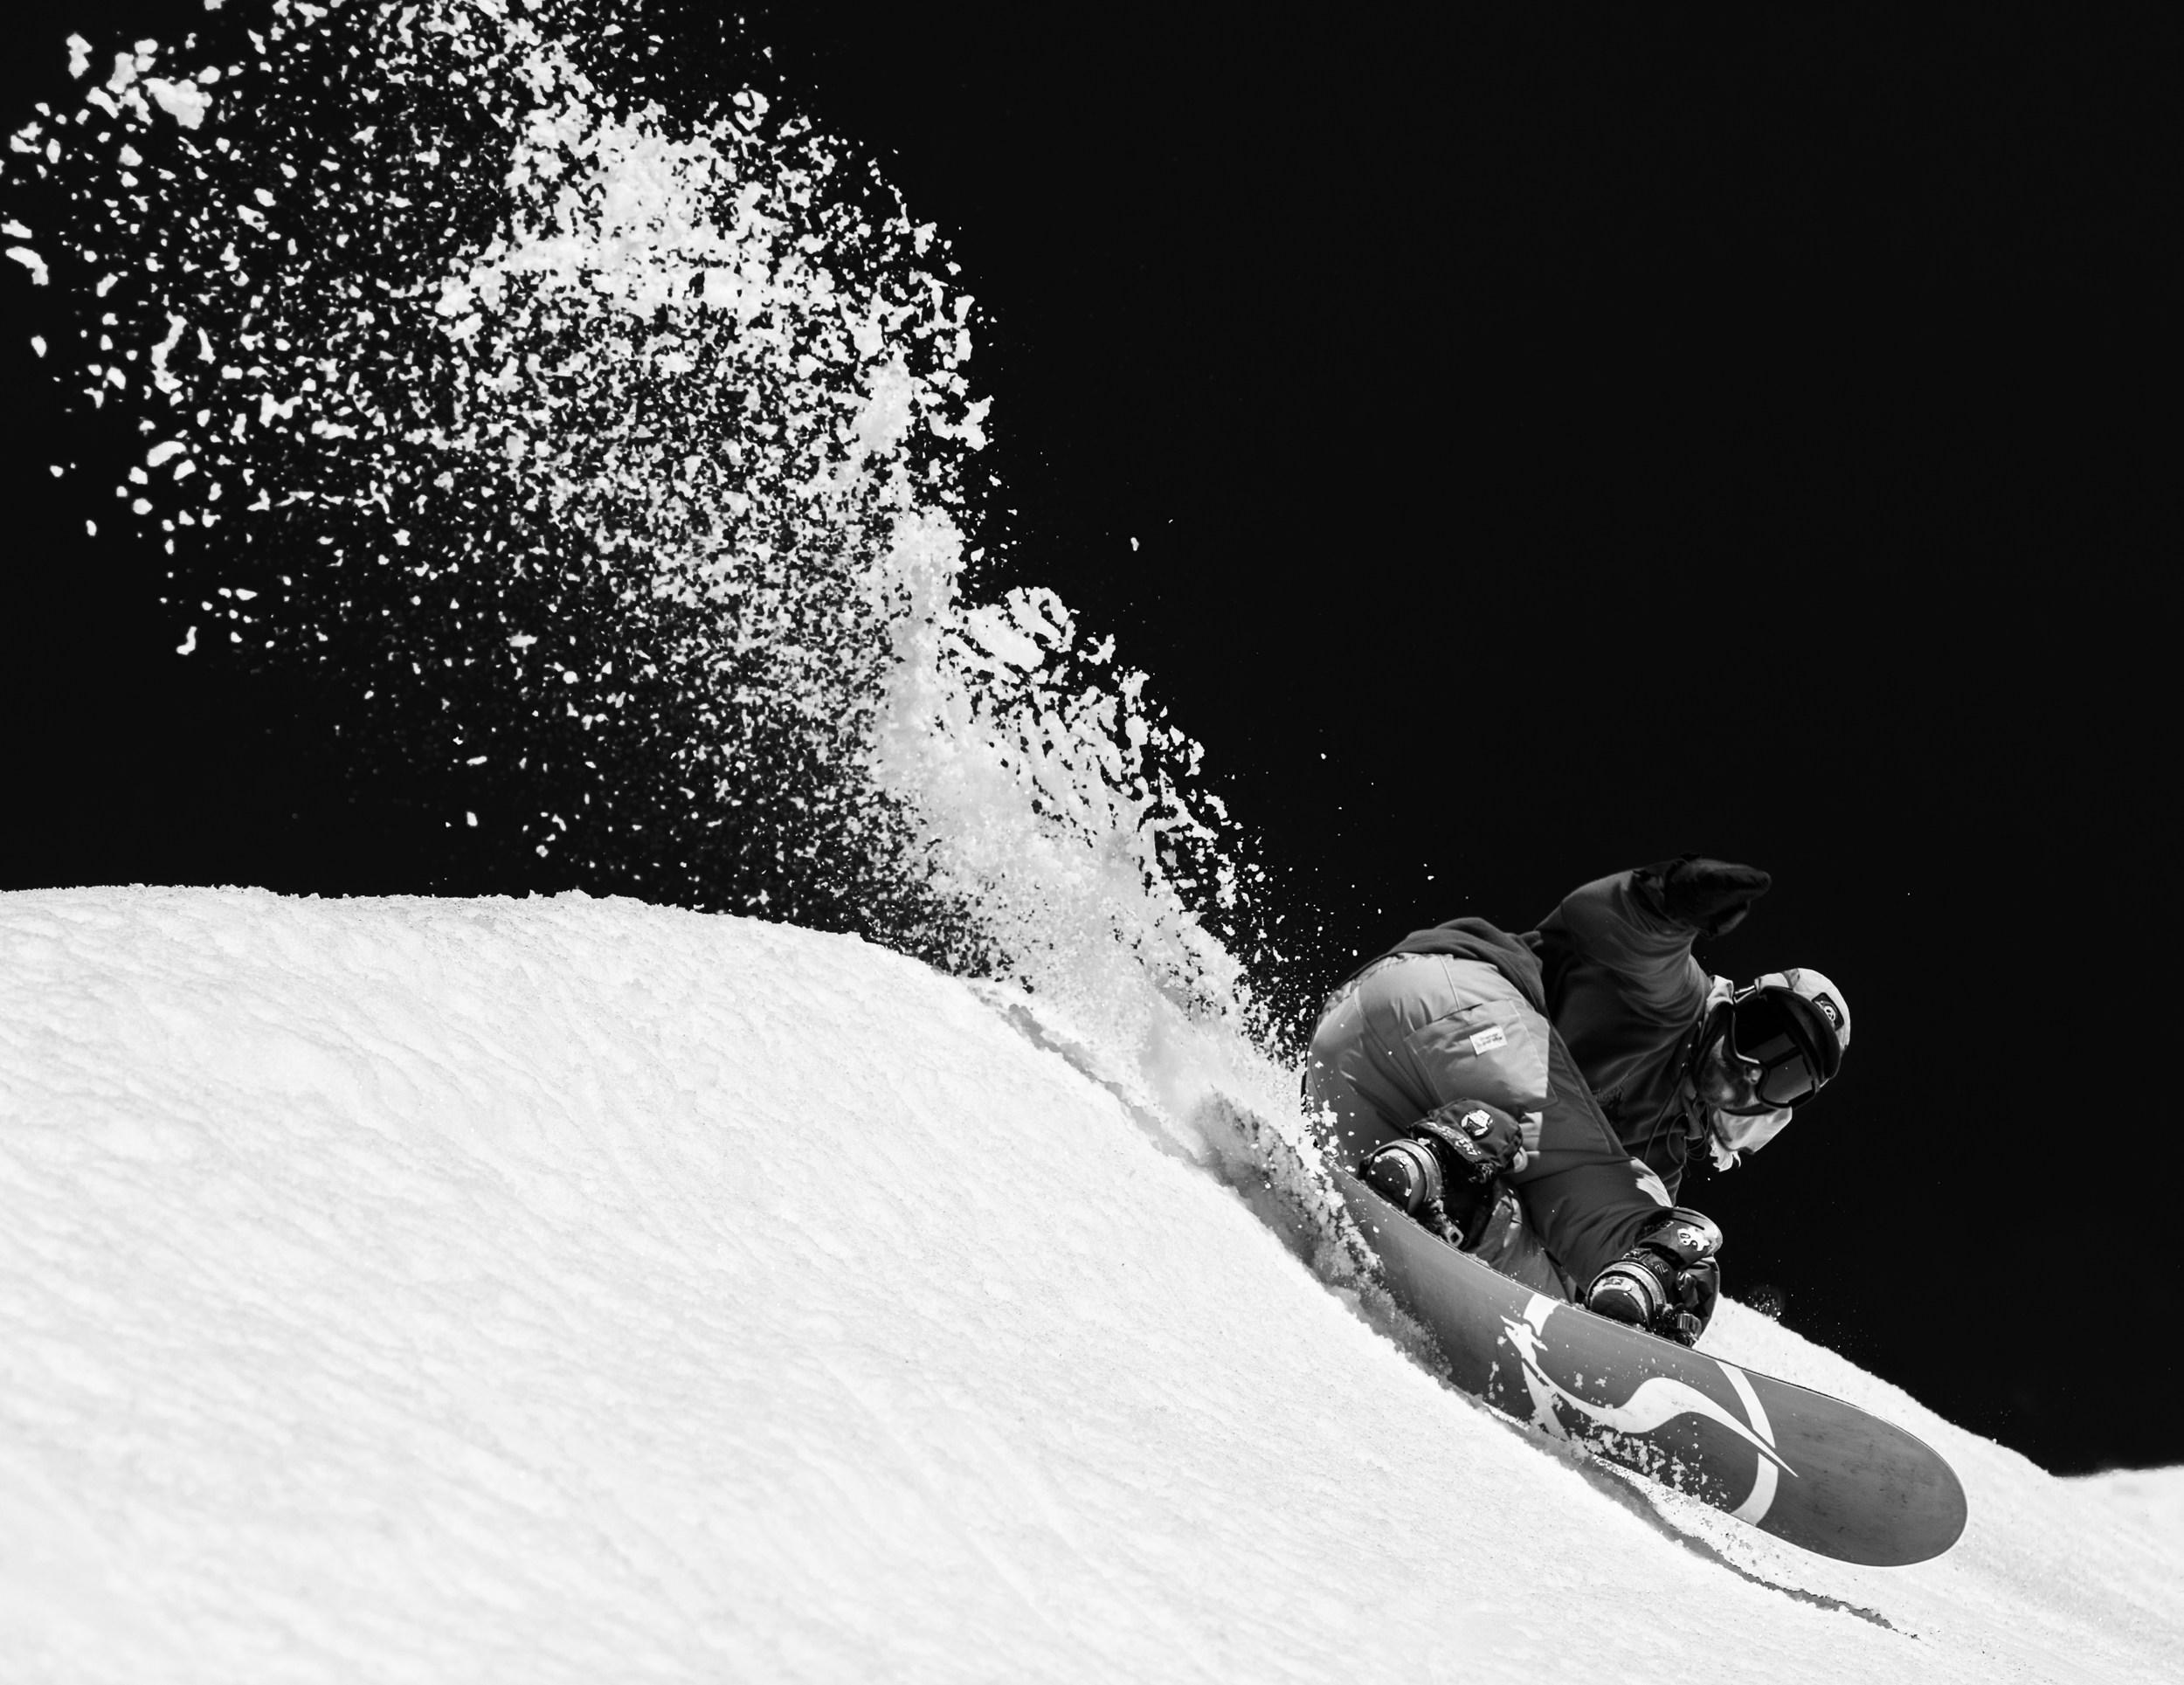 Mike Dawson Mt Hood Photo Gallery